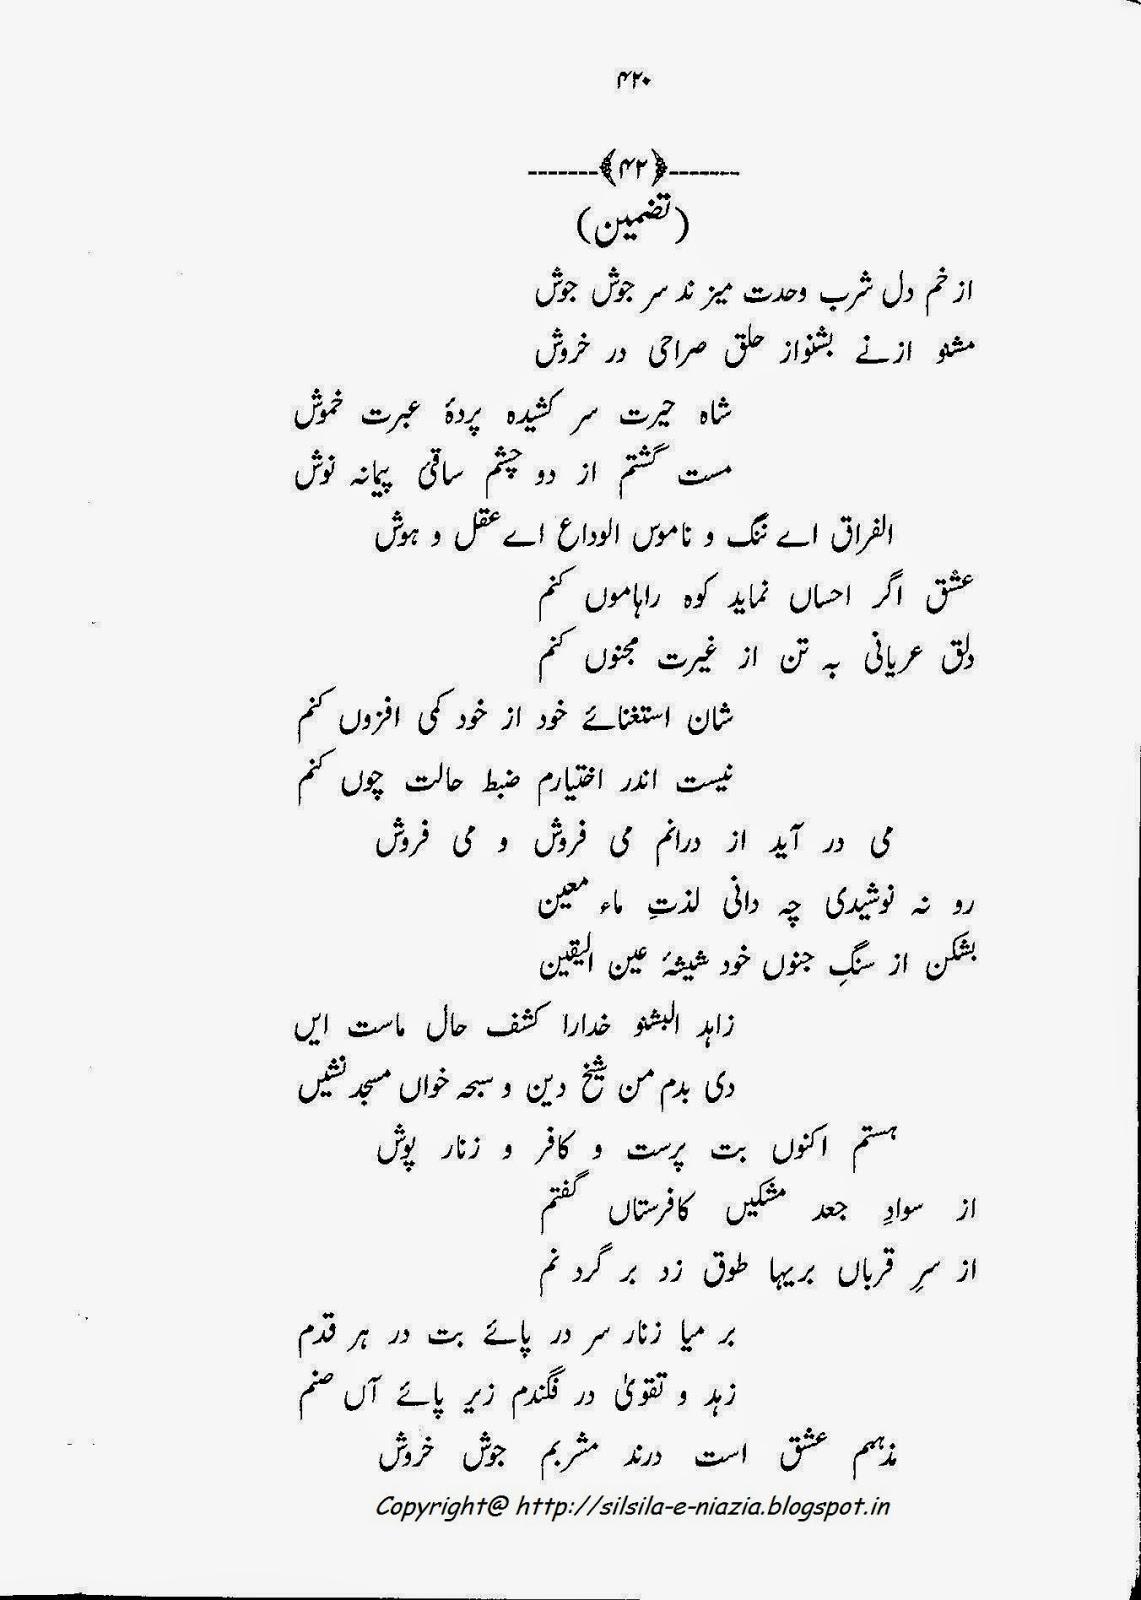 Silsila-e-Niazia: Deewan Raaz-e-Niaz (Farsi)